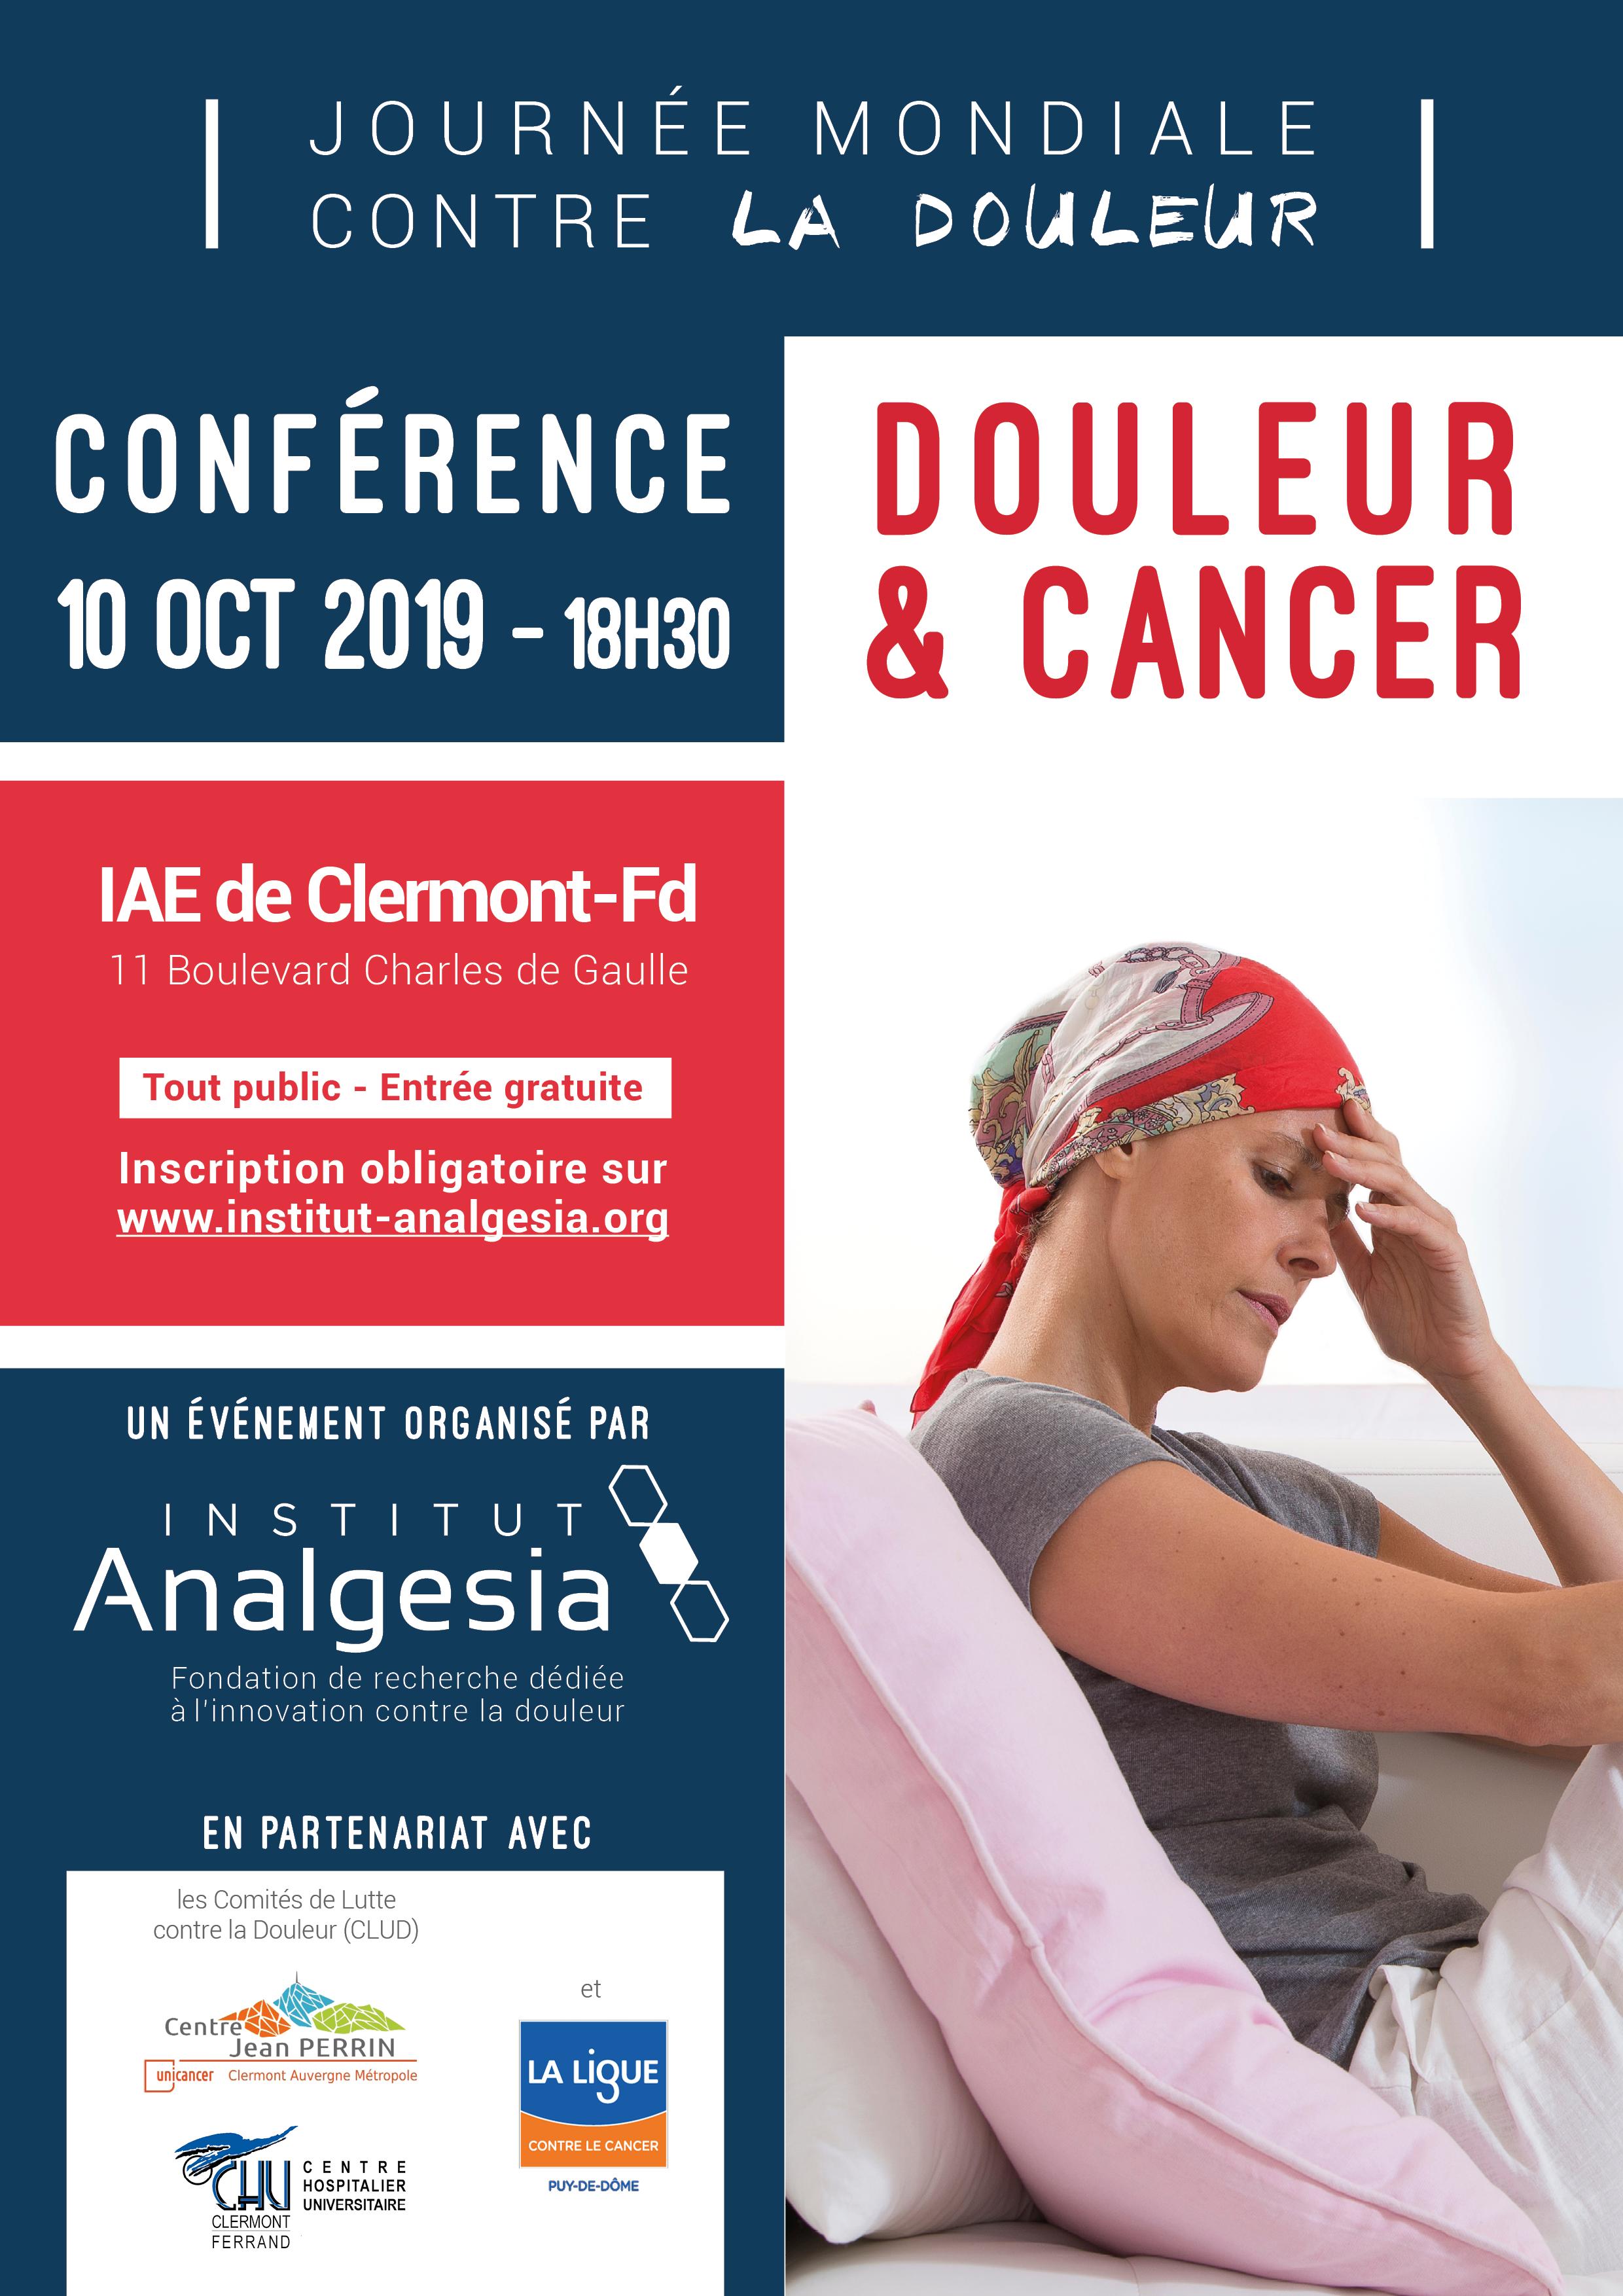 Invitation conférence Douleur & Cancer